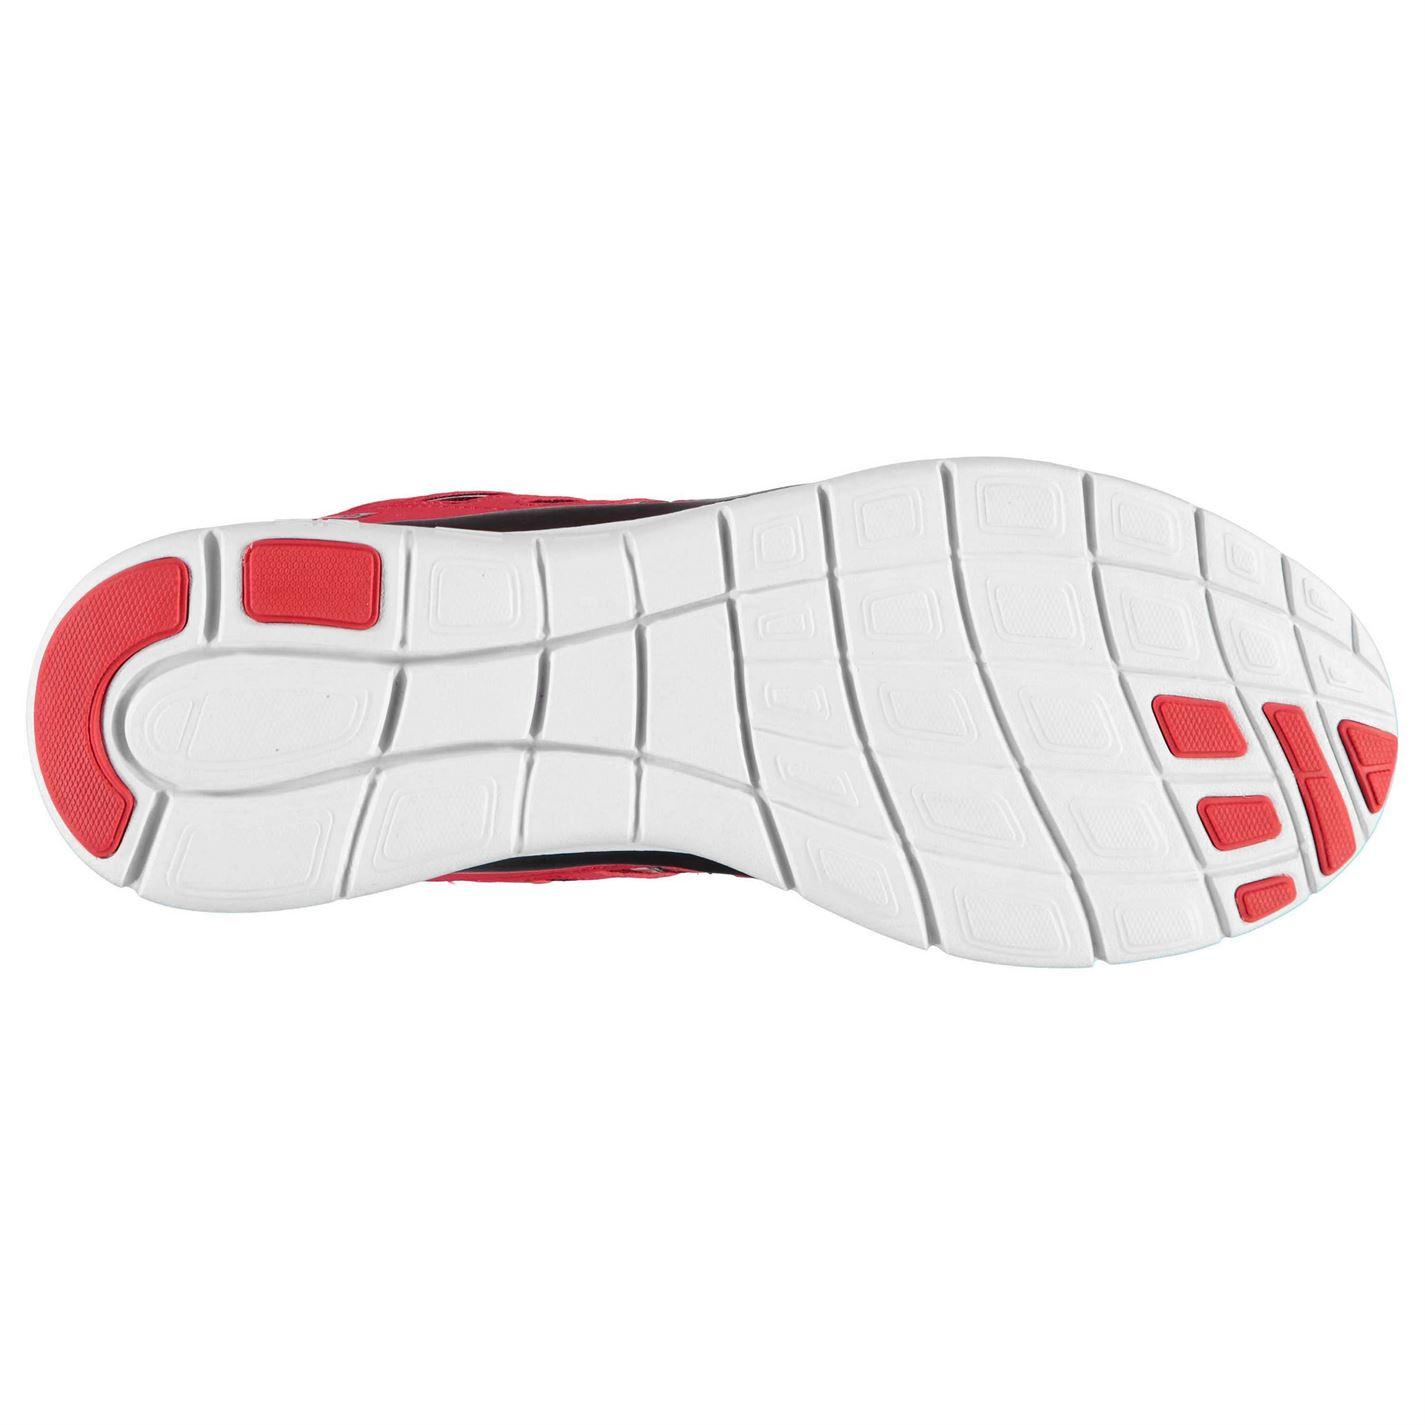 Karrimor-Mens-Duma-Trainers-Lace-Up-Sports-Running-Cross-Training-Shoes thumbnail 44